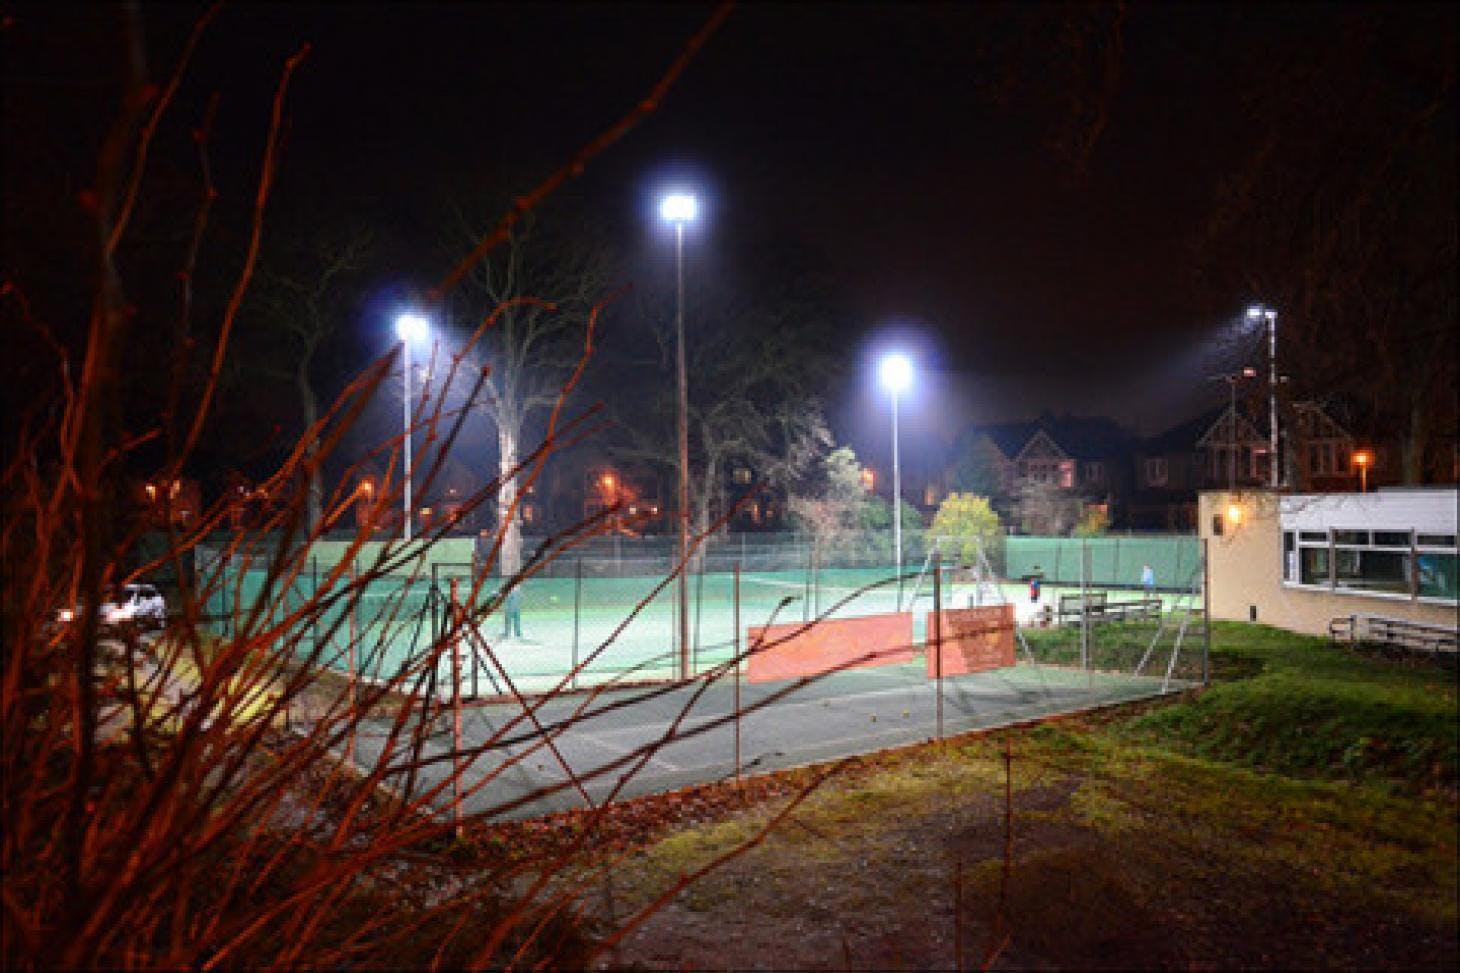 Aldersbrook Lawn Tennis Club Outdoor | Hard (macadam) tennis court